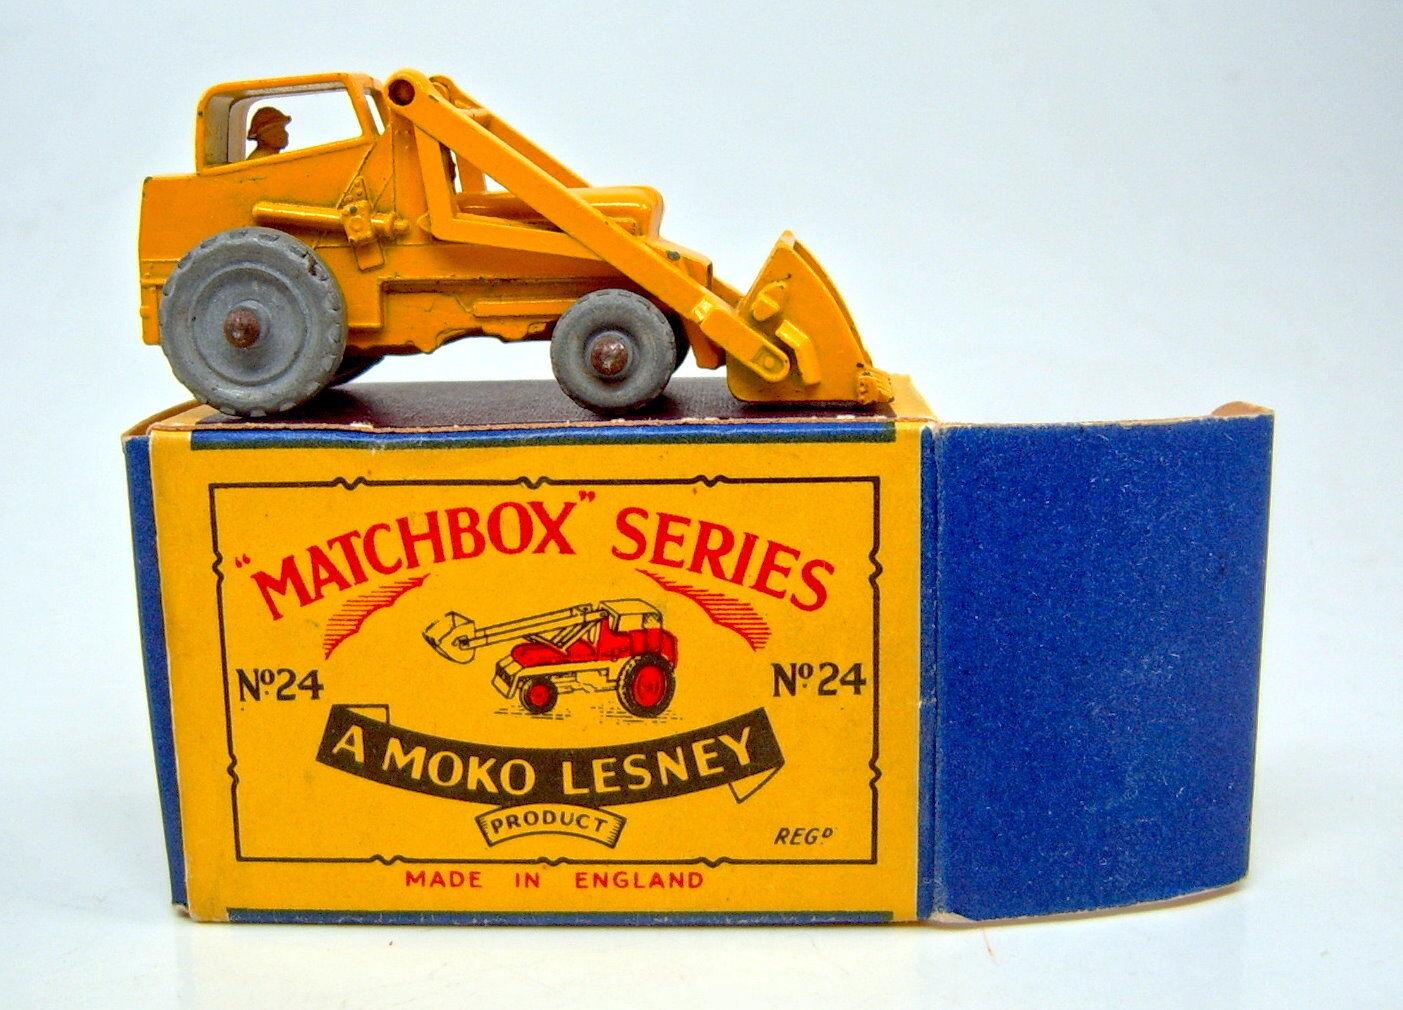 Matchbox RW 24 a HYDRAULIC EXCAVATOR jaune dans  Petit Moko  BOX